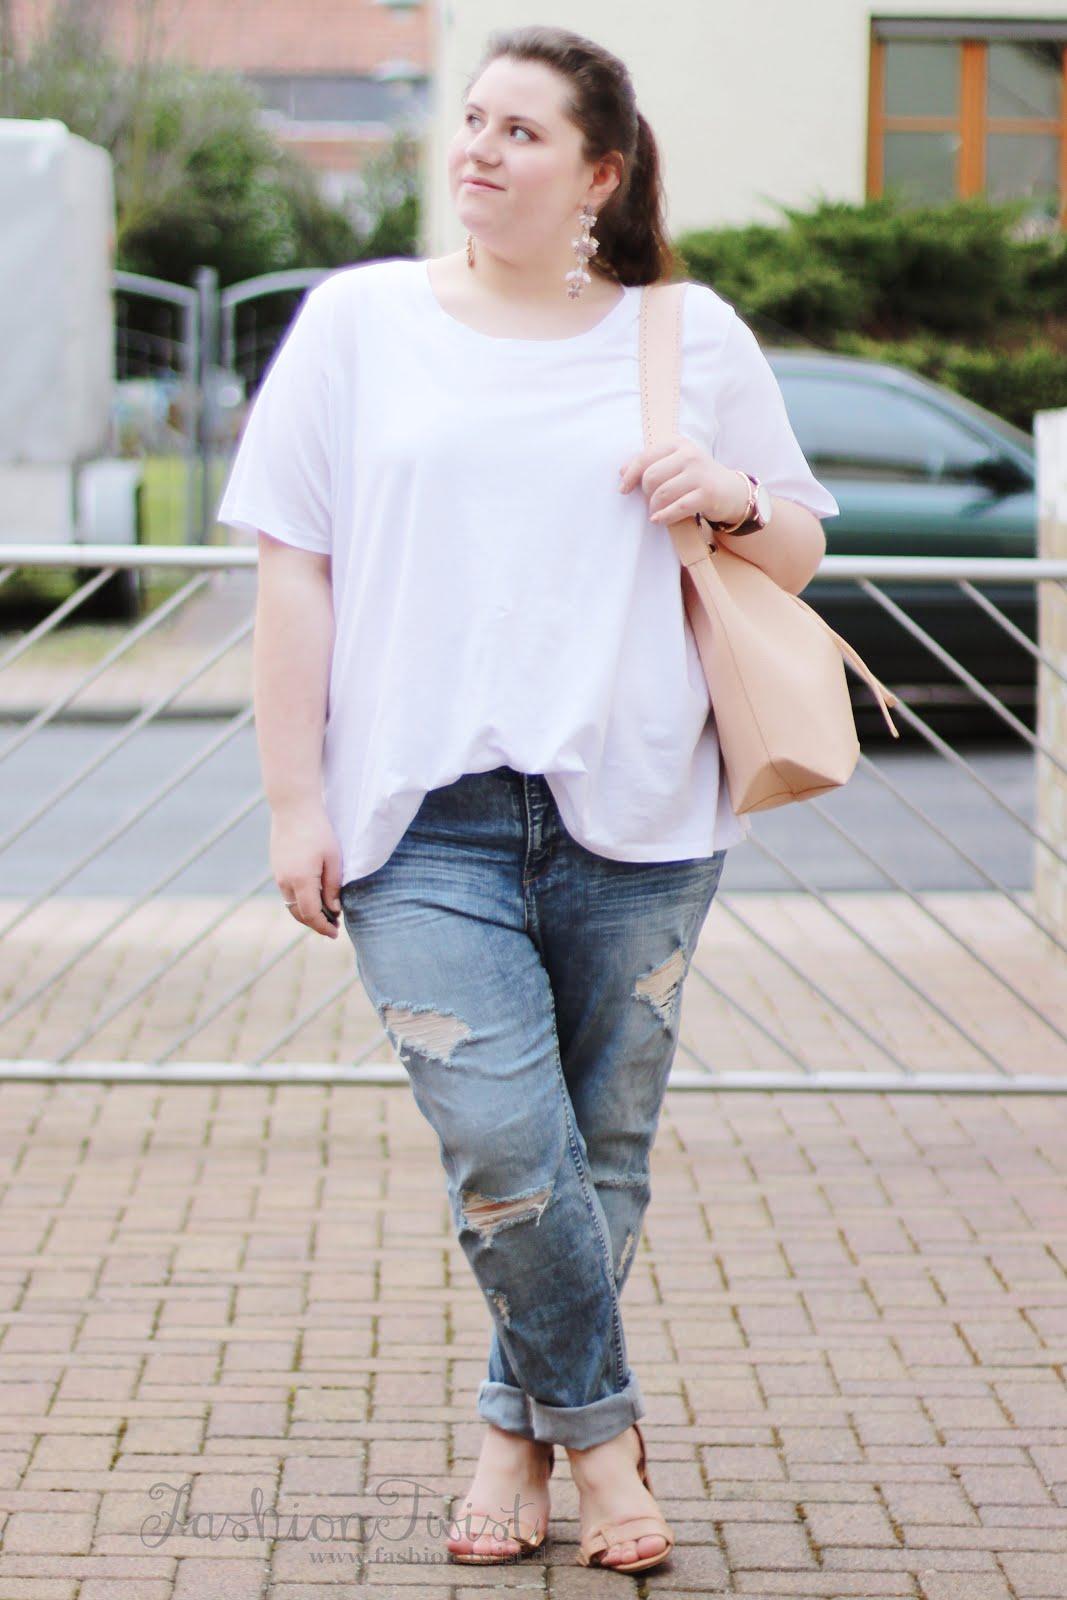 Bloggerin